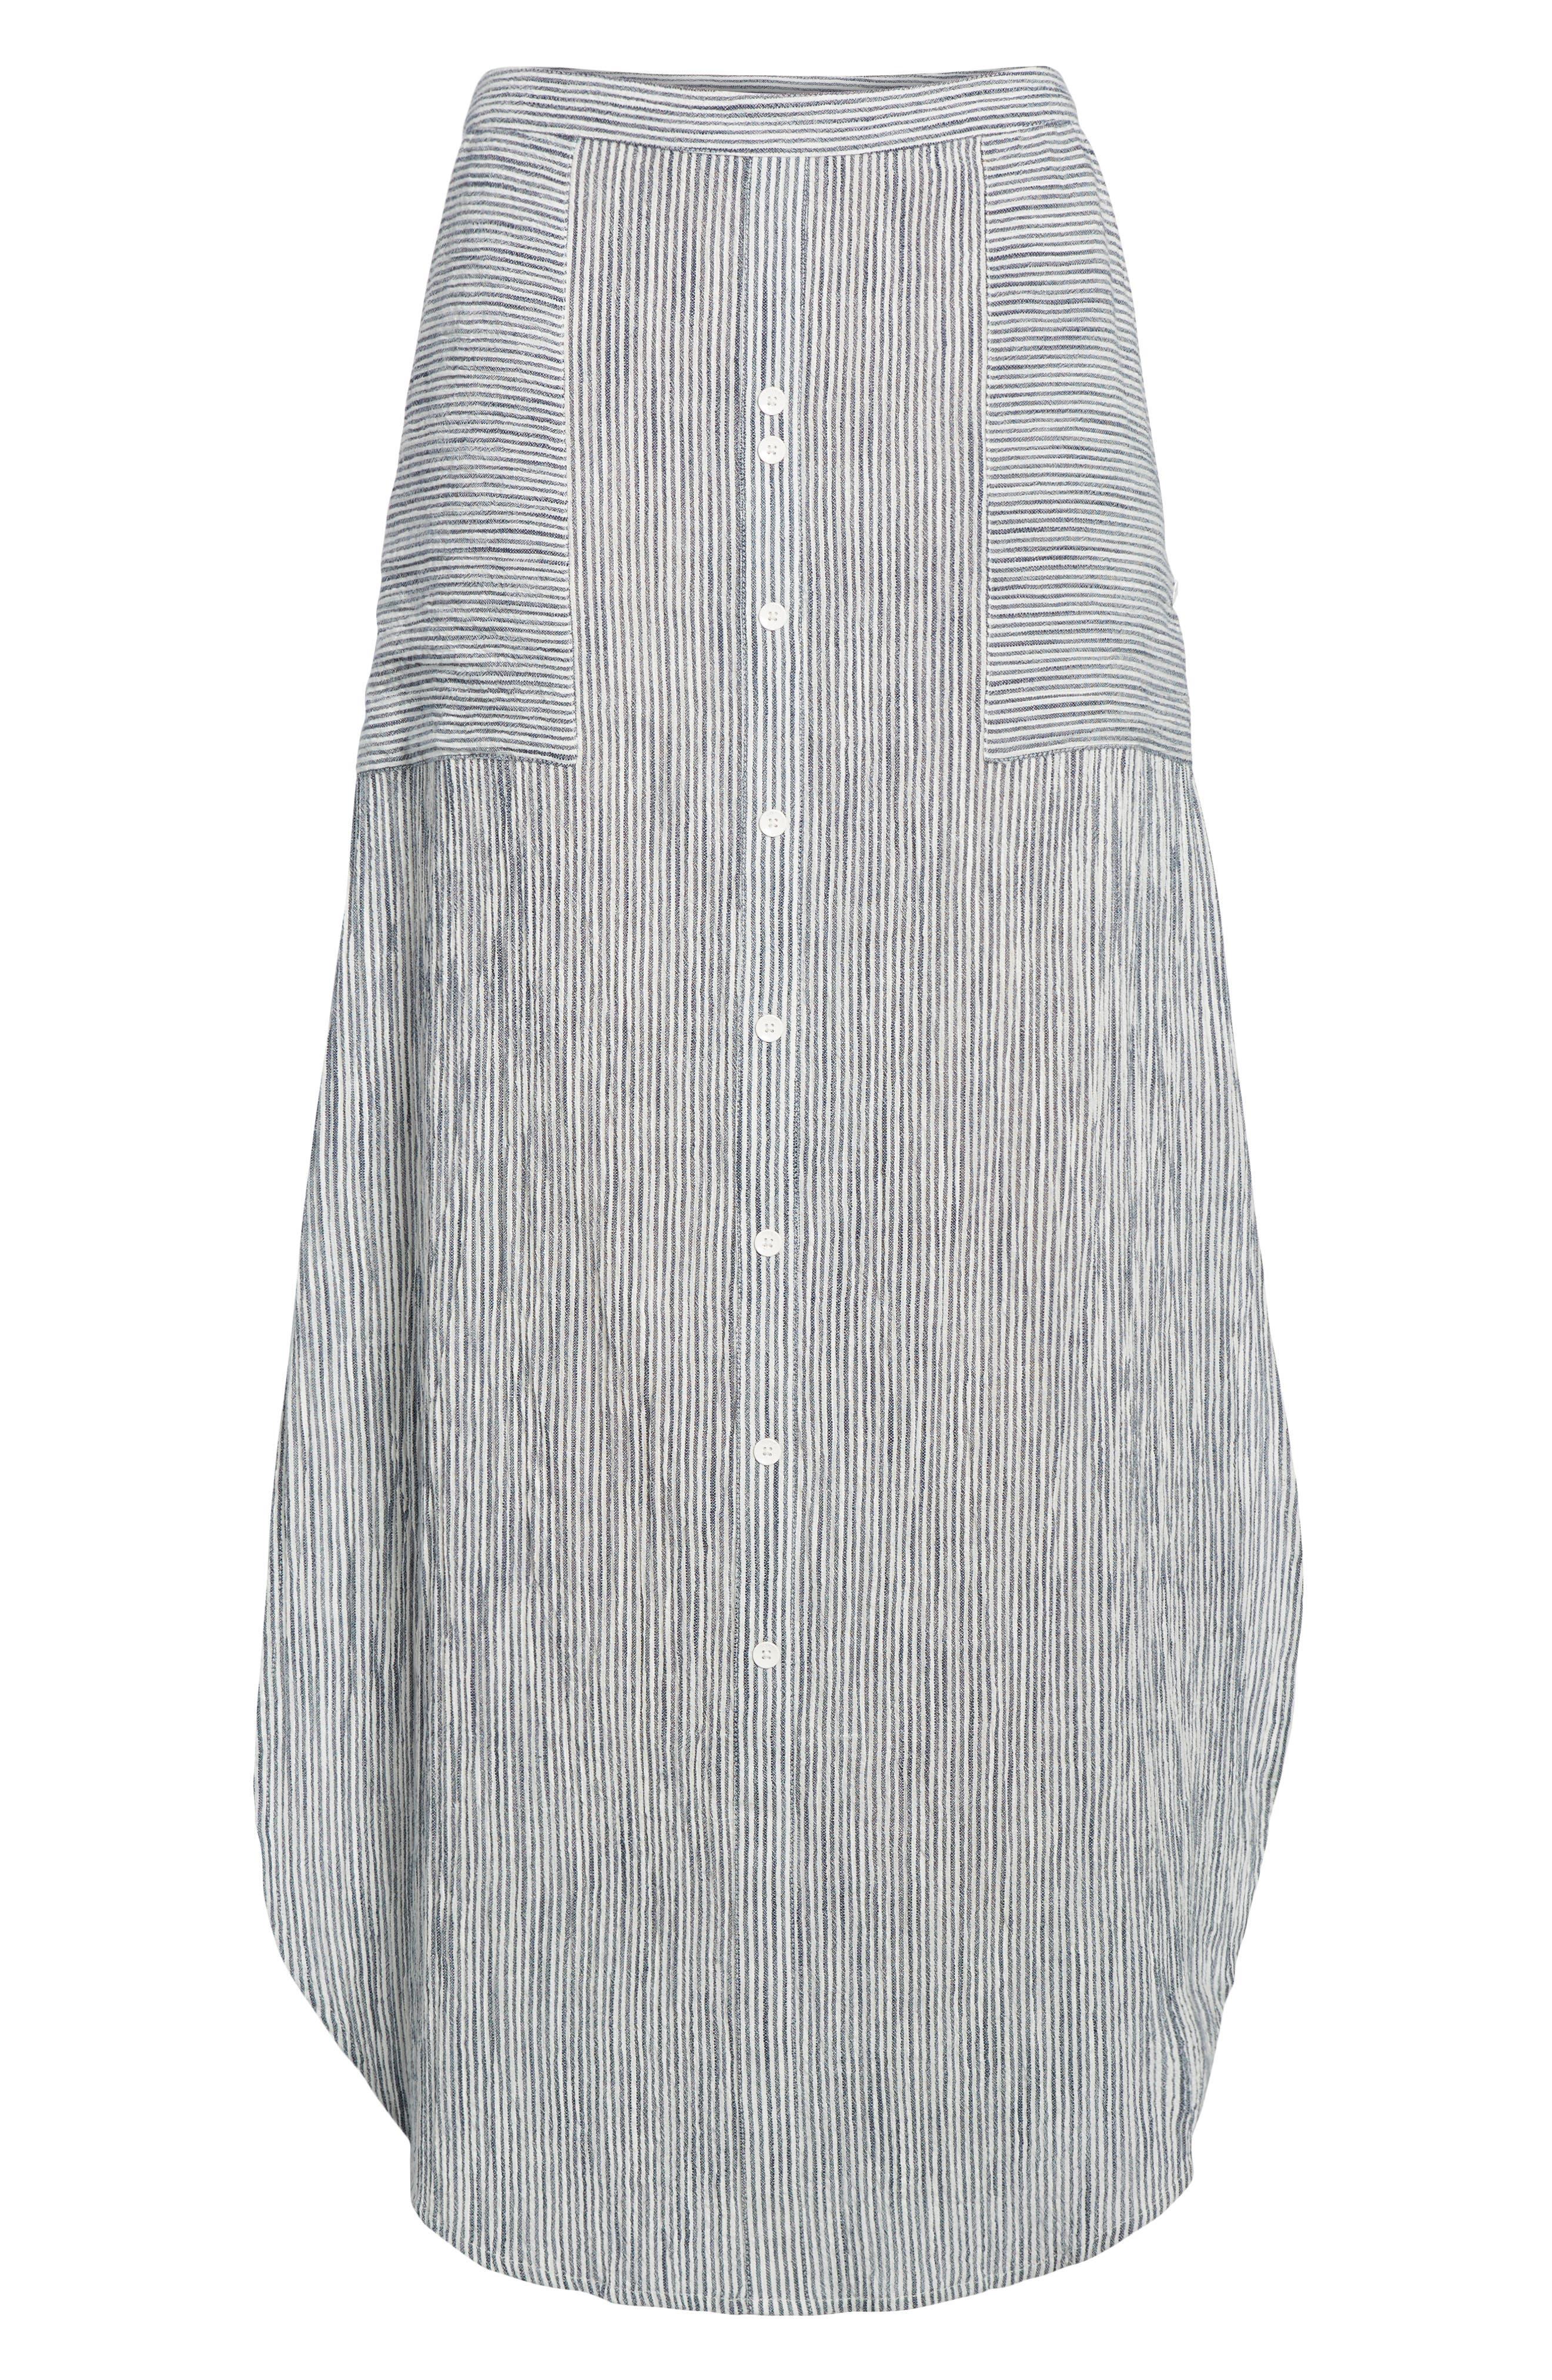 Sunset Islands Pinstripe Maxi Skirt,                             Alternate thumbnail 6, color,